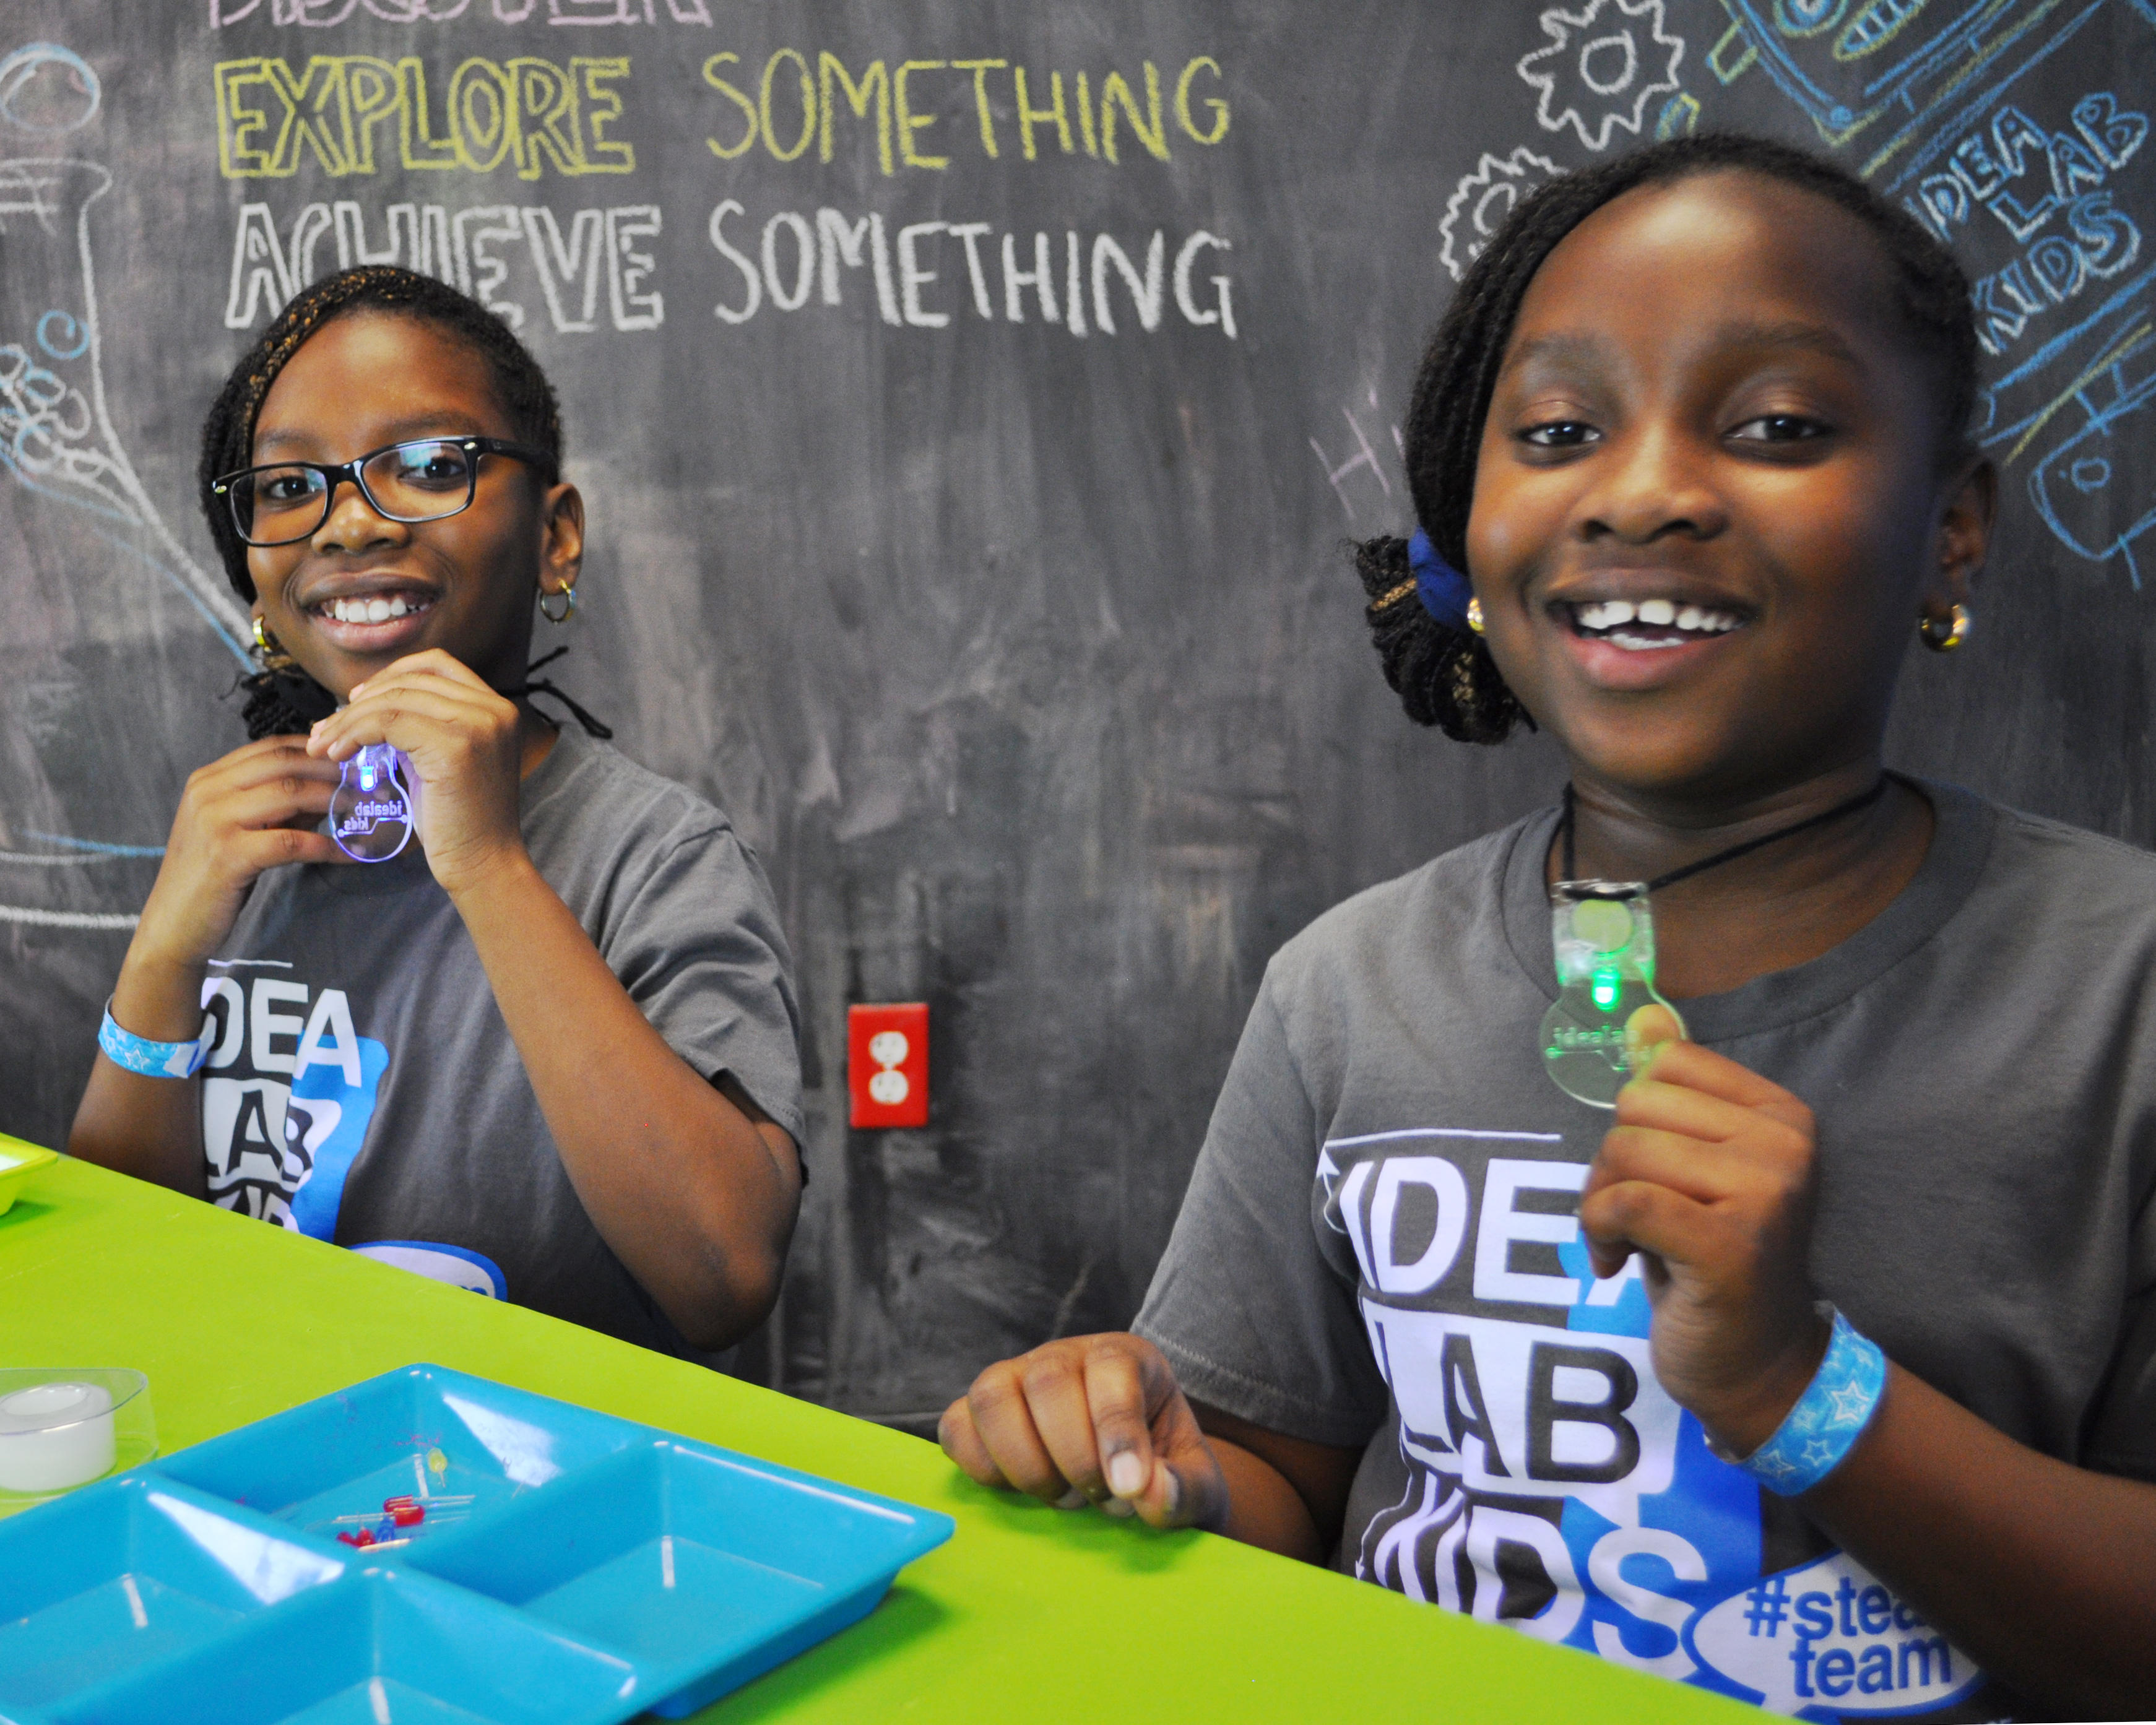 IDEA Lab Kids (Pearland) image 5